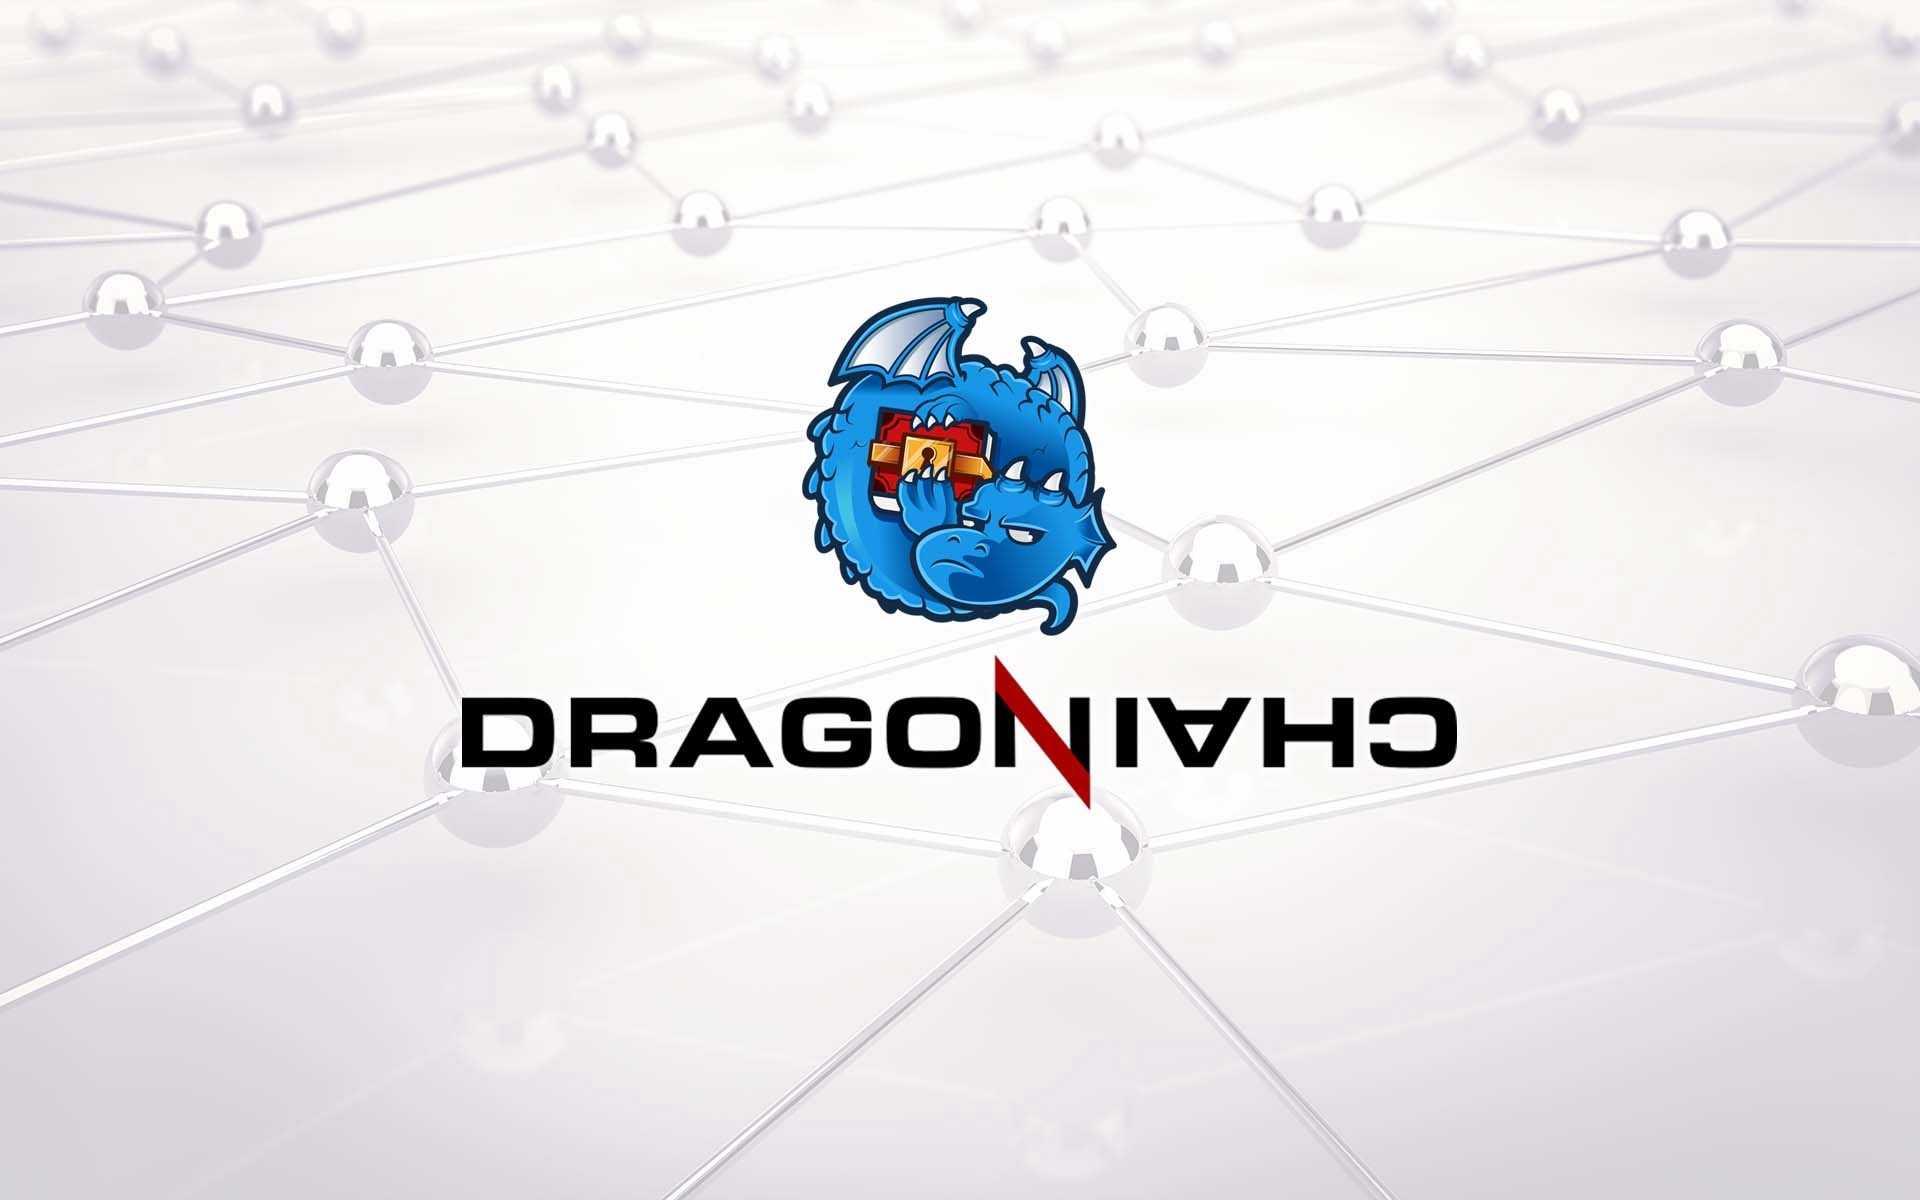 Бизнес платформа Dragonchain собрала деньги на реализацию плана развития